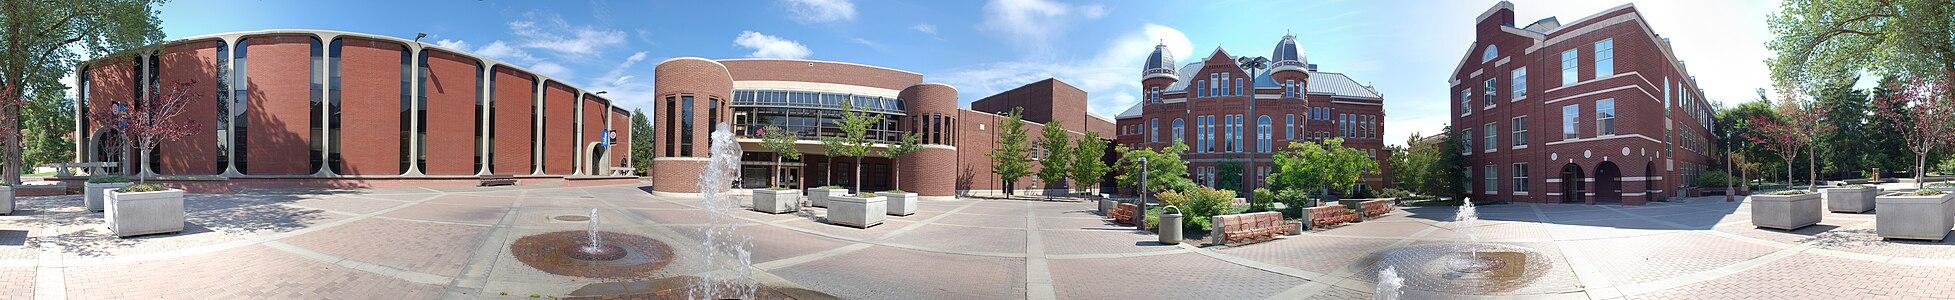 Central Washington University Wikipedia